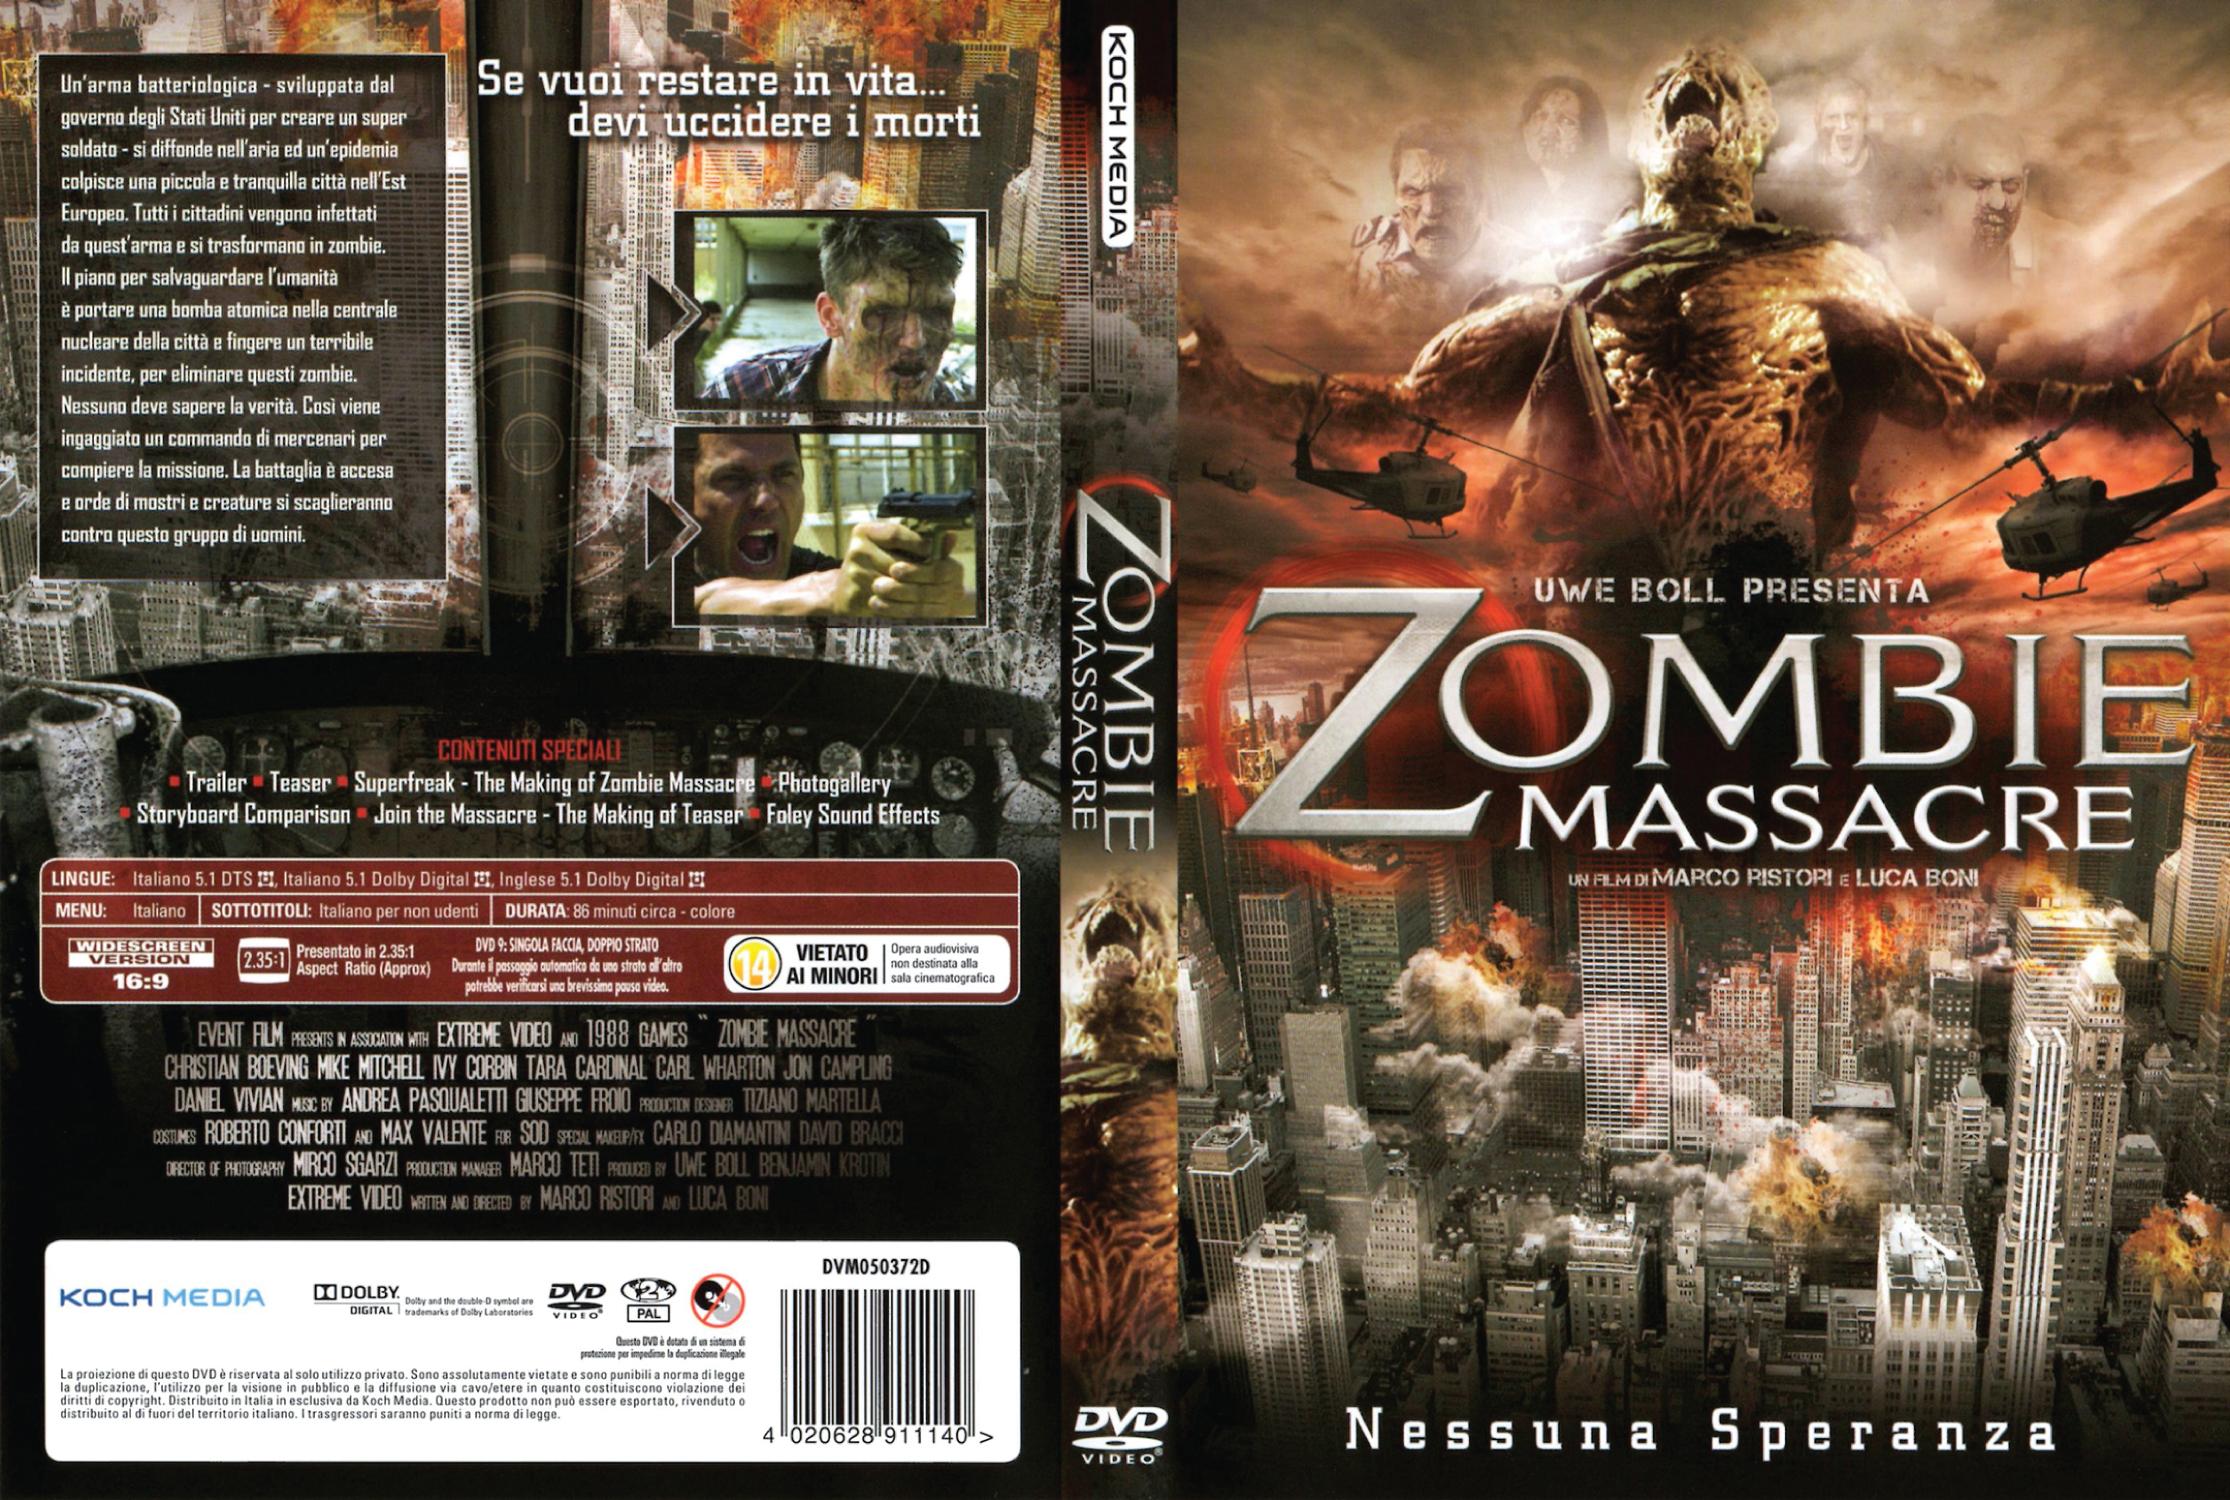 Covers Box Sk Zombie Massacre 2013 High Quality Dvd Blueray Movie